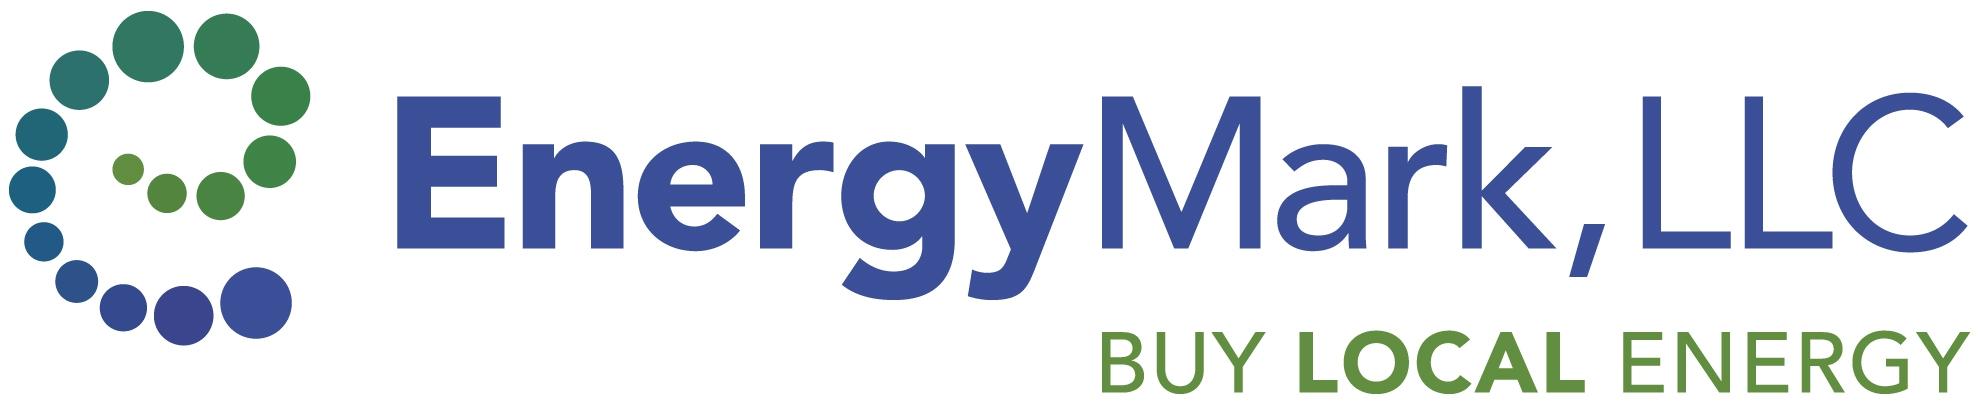 EnergyMark